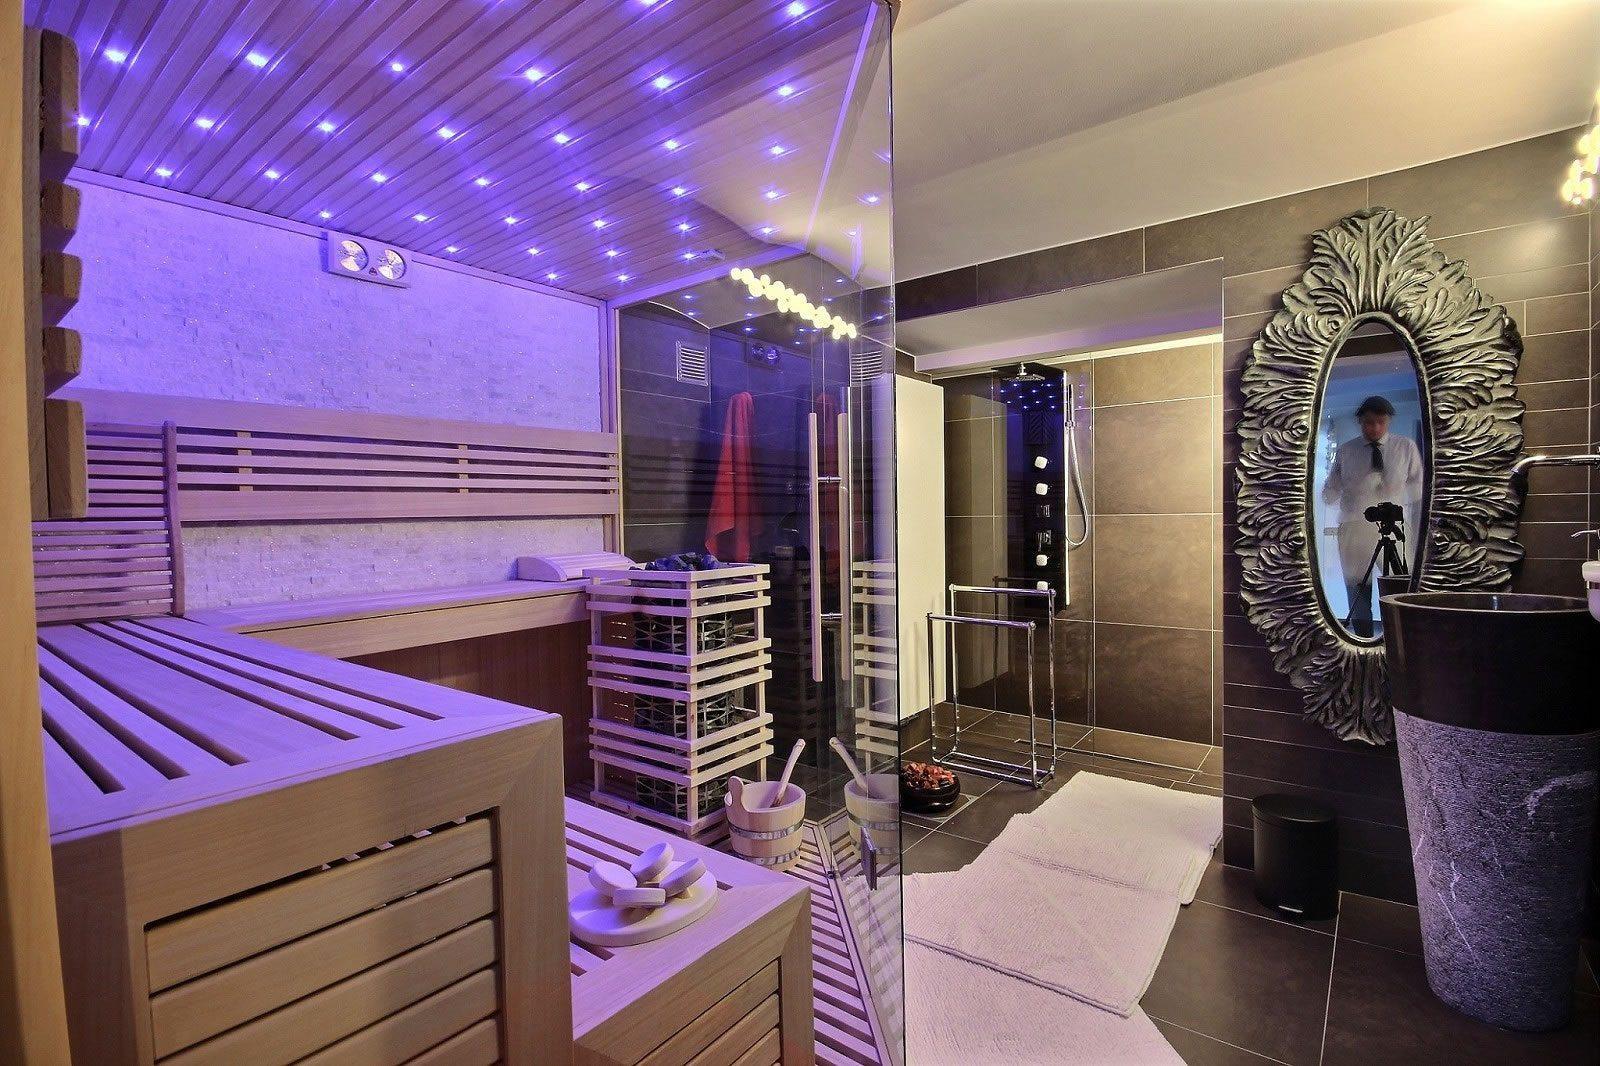 superbe-villa-renovee-rhode-saint-genese-jardin-terrasse-csuperbe-villa-renovee-rhode-saint-genese-jardin-terrasse-cave-saunaave-sauna